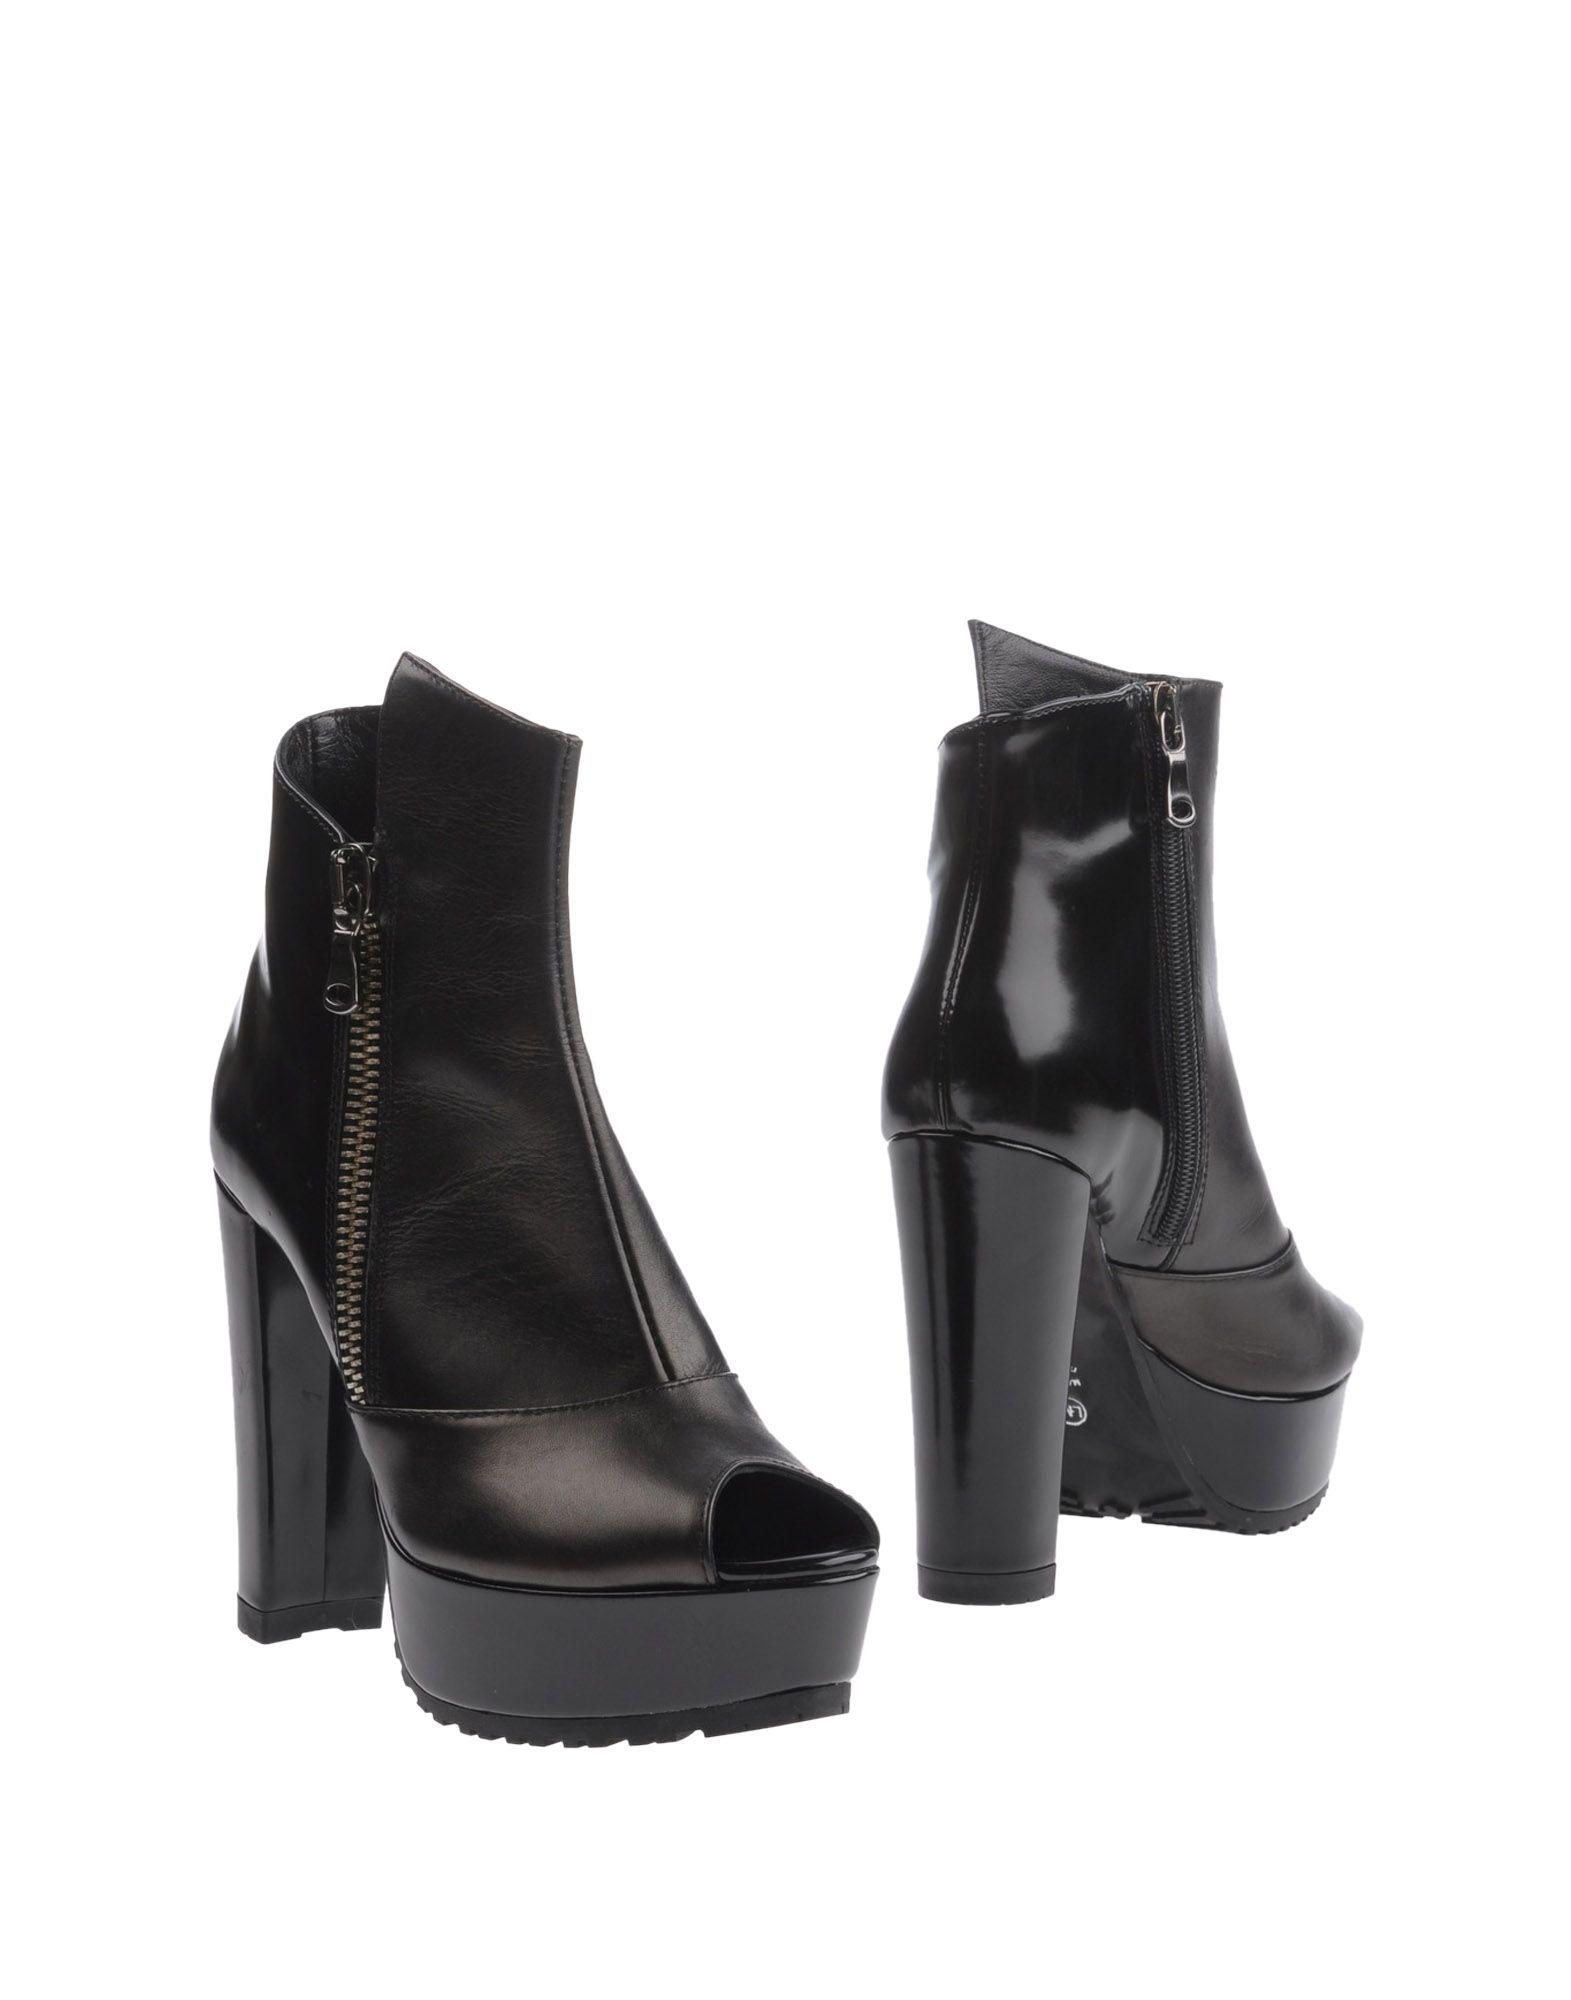 Lorenzo Mari Stiefelette Damen  11220253CU Gute Qualität beliebte Schuhe